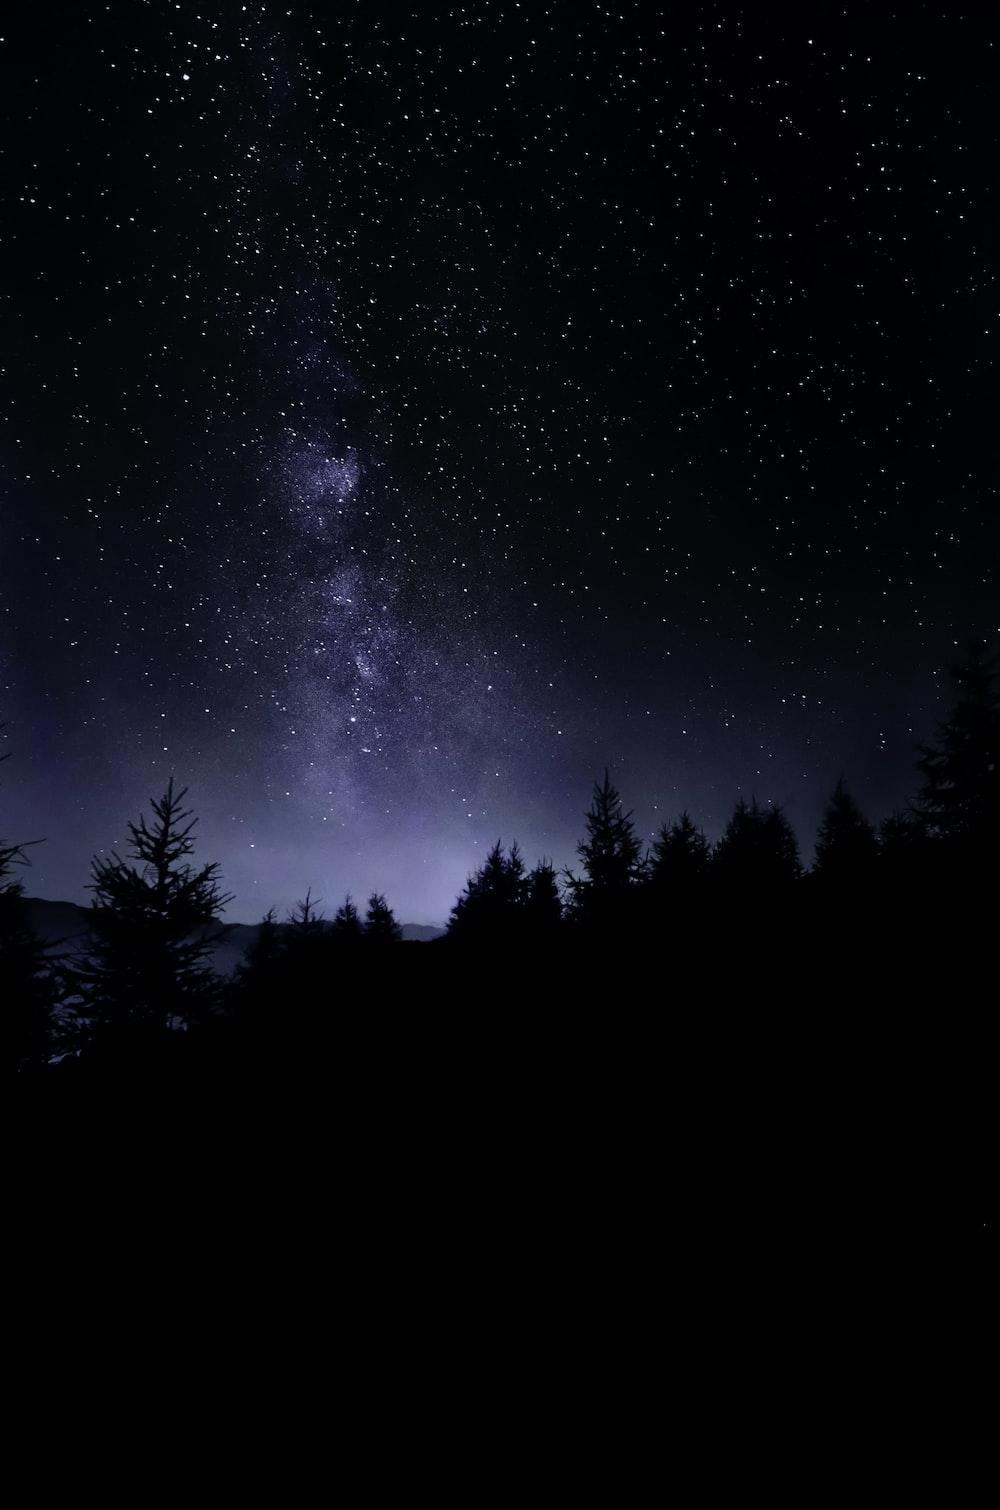 pine trees under starry sky